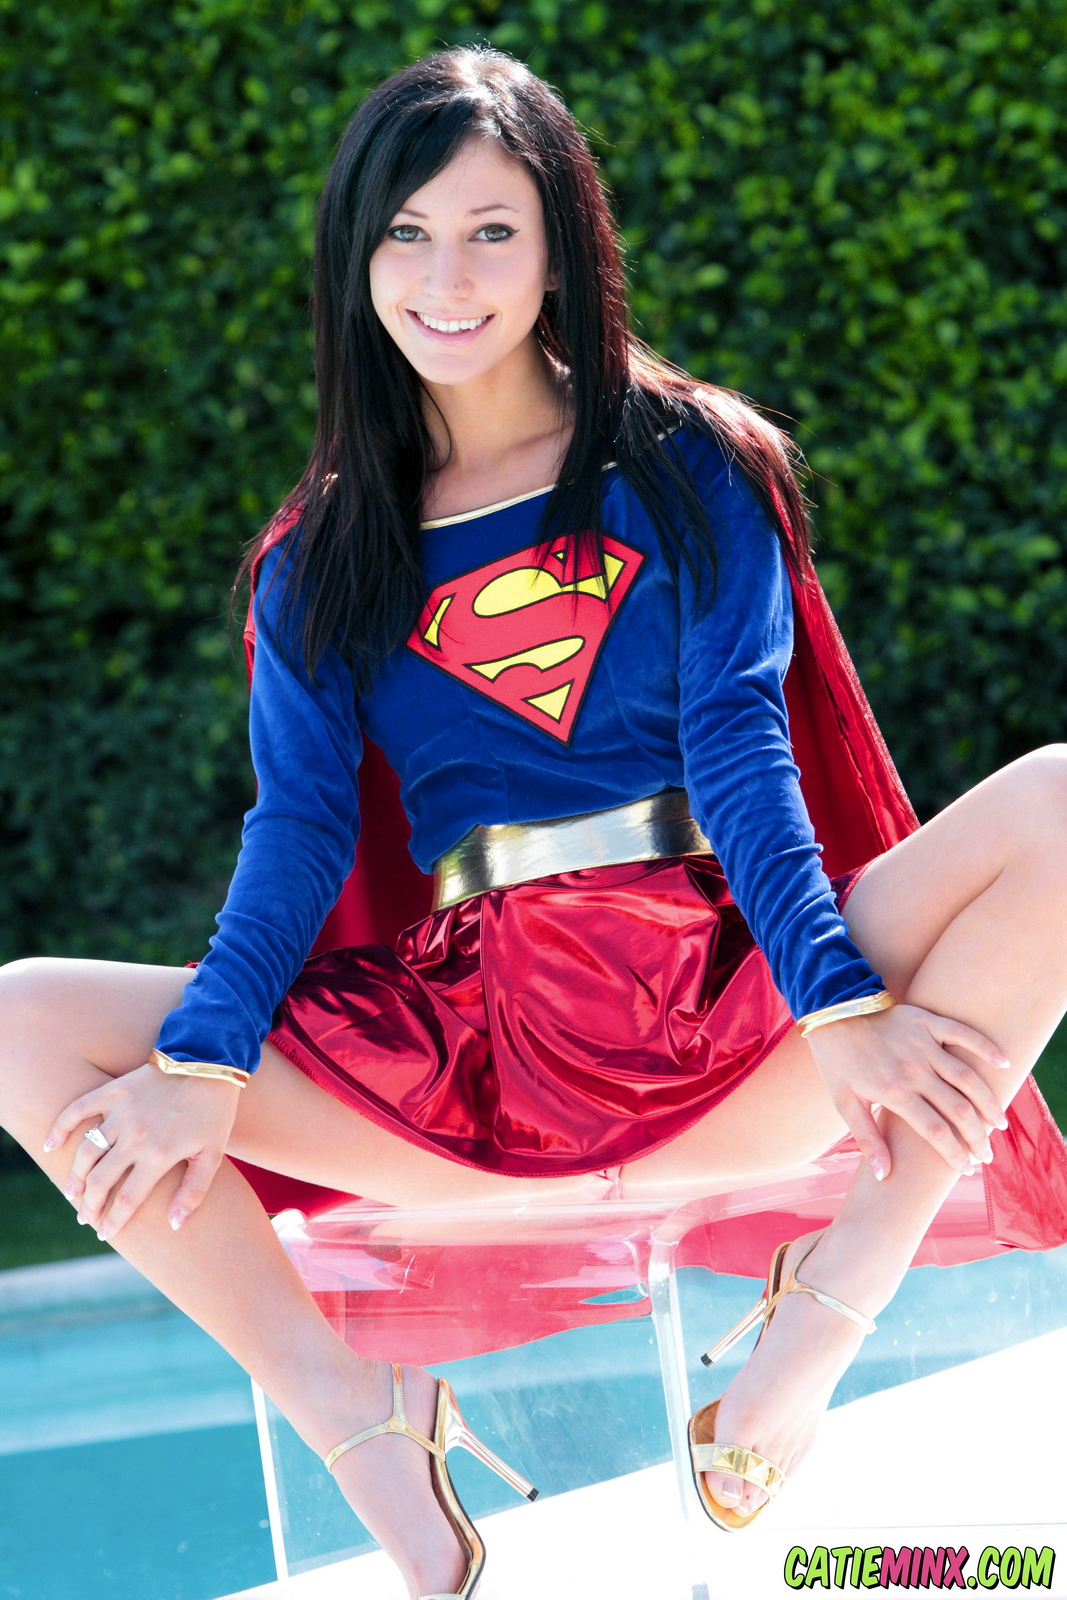 catie-minx-supergirl-costiume-poolside-young-brunette-nude-07